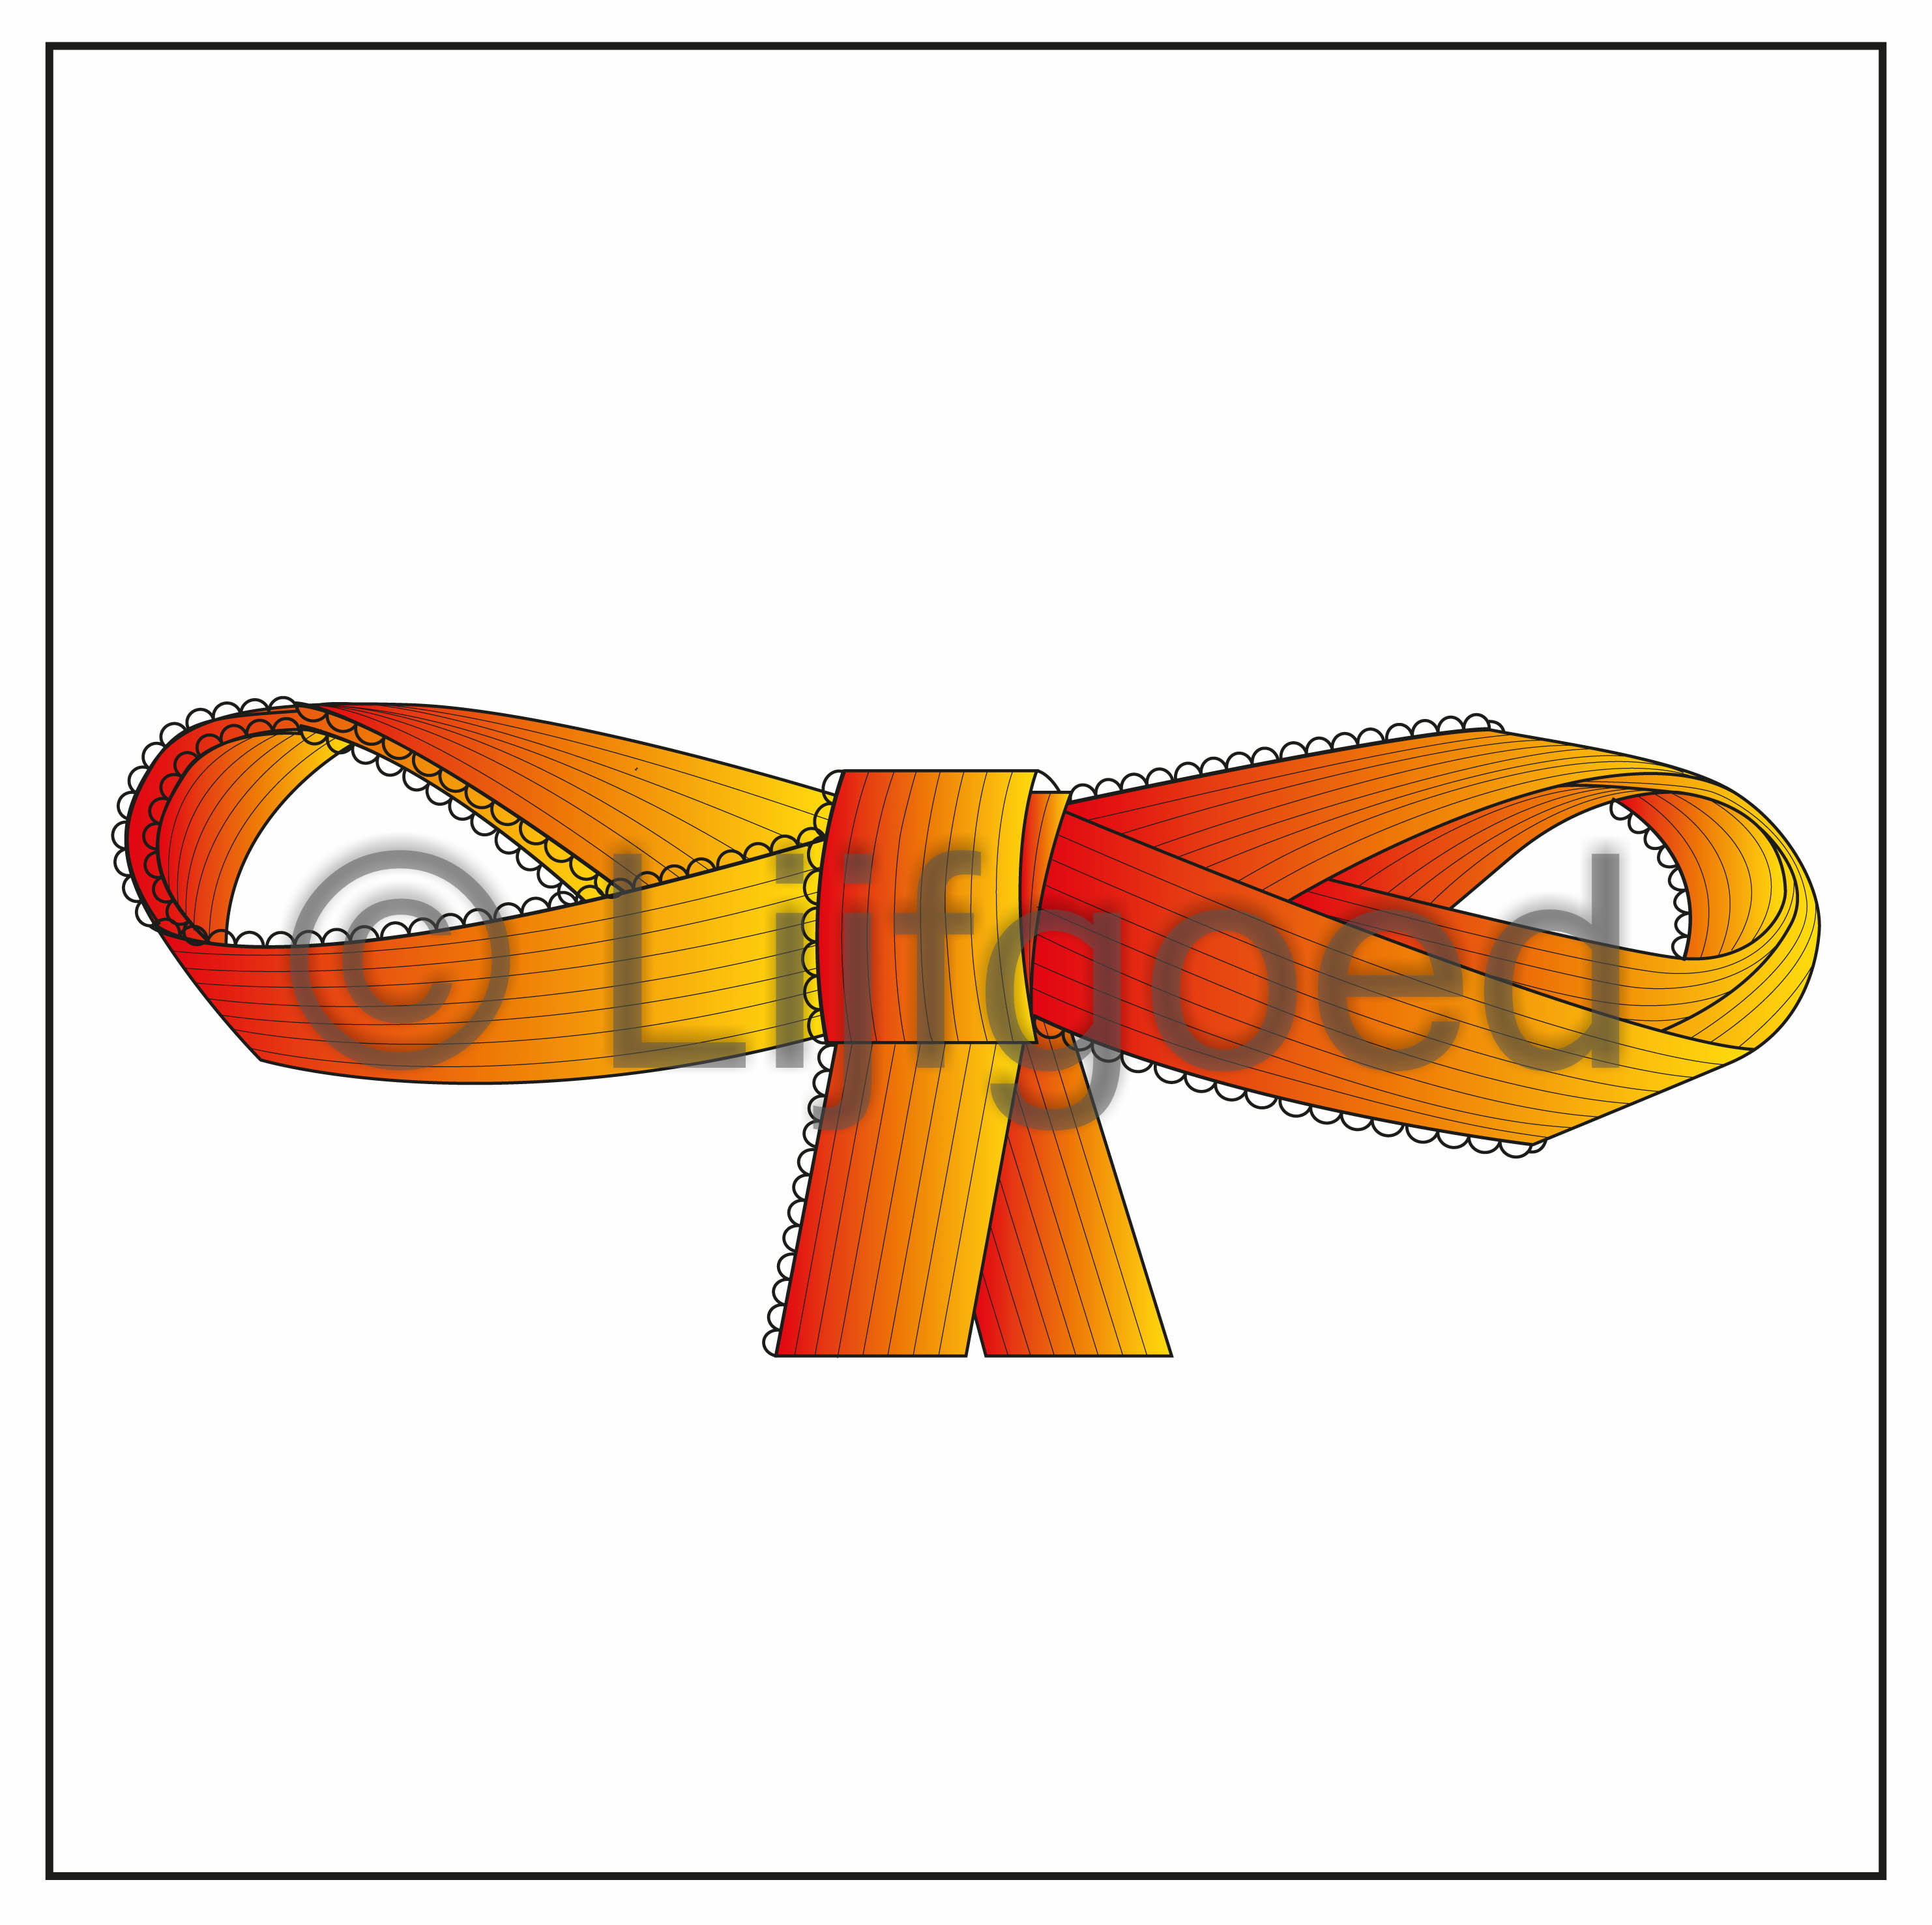 rood-oranje-geel